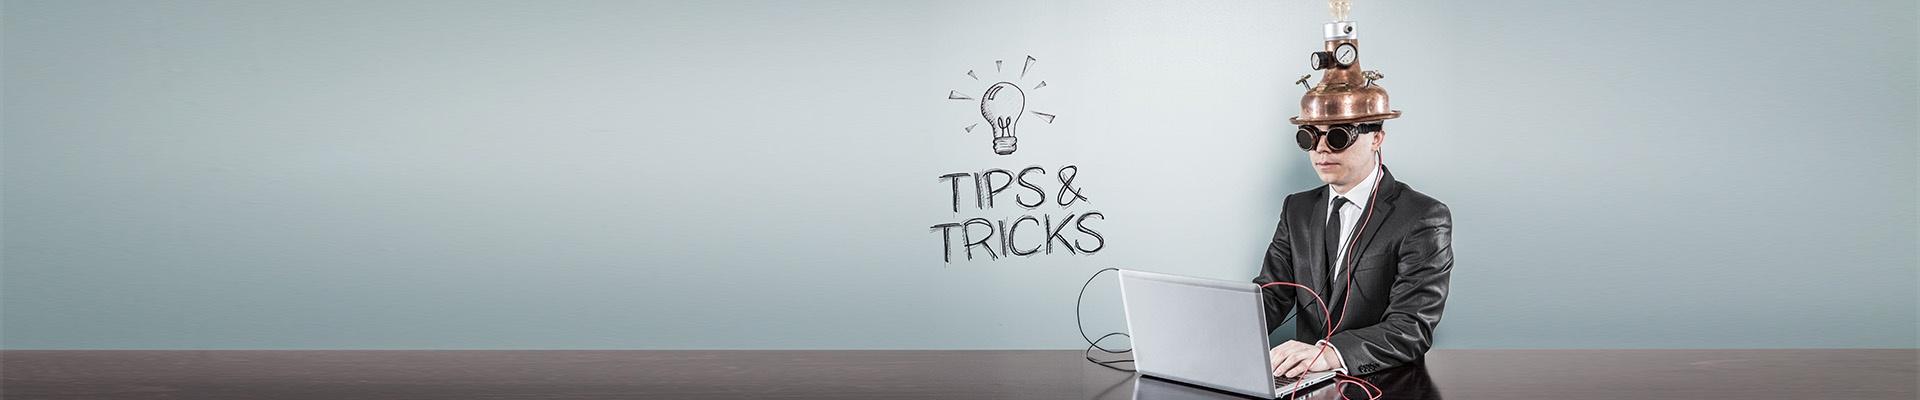 BSP_Blog_NetSuiteTipsTricks_Top.jpg